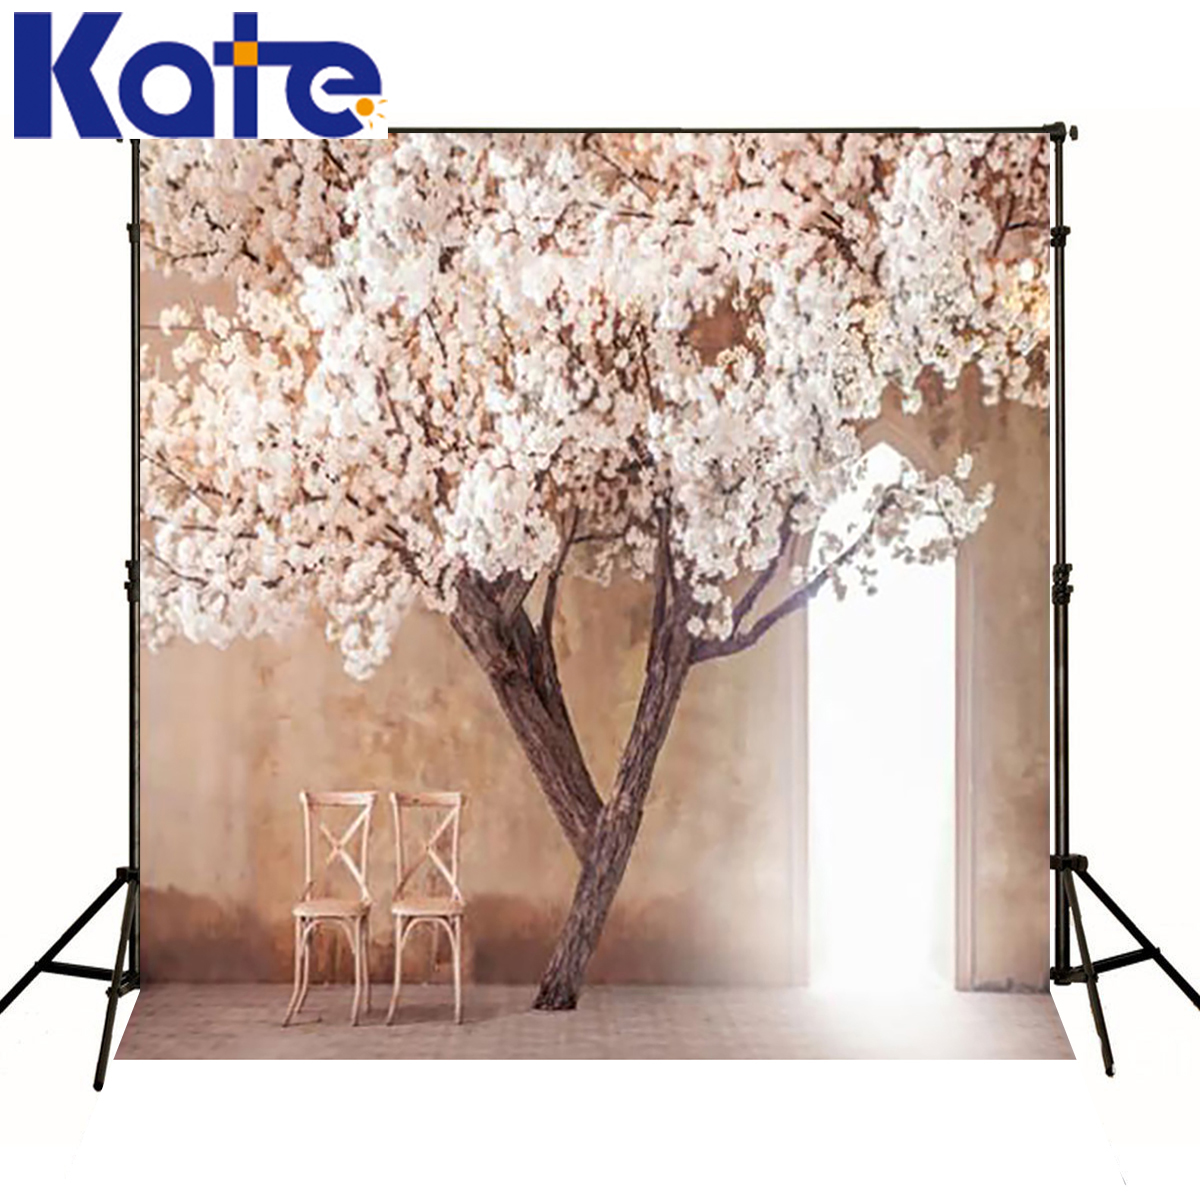 Kate 8x8ft Indoor Wedding Room Backdrops Solid WhiteWood Floor Wedding Photography Background for fondos de estudio fotografia<br>